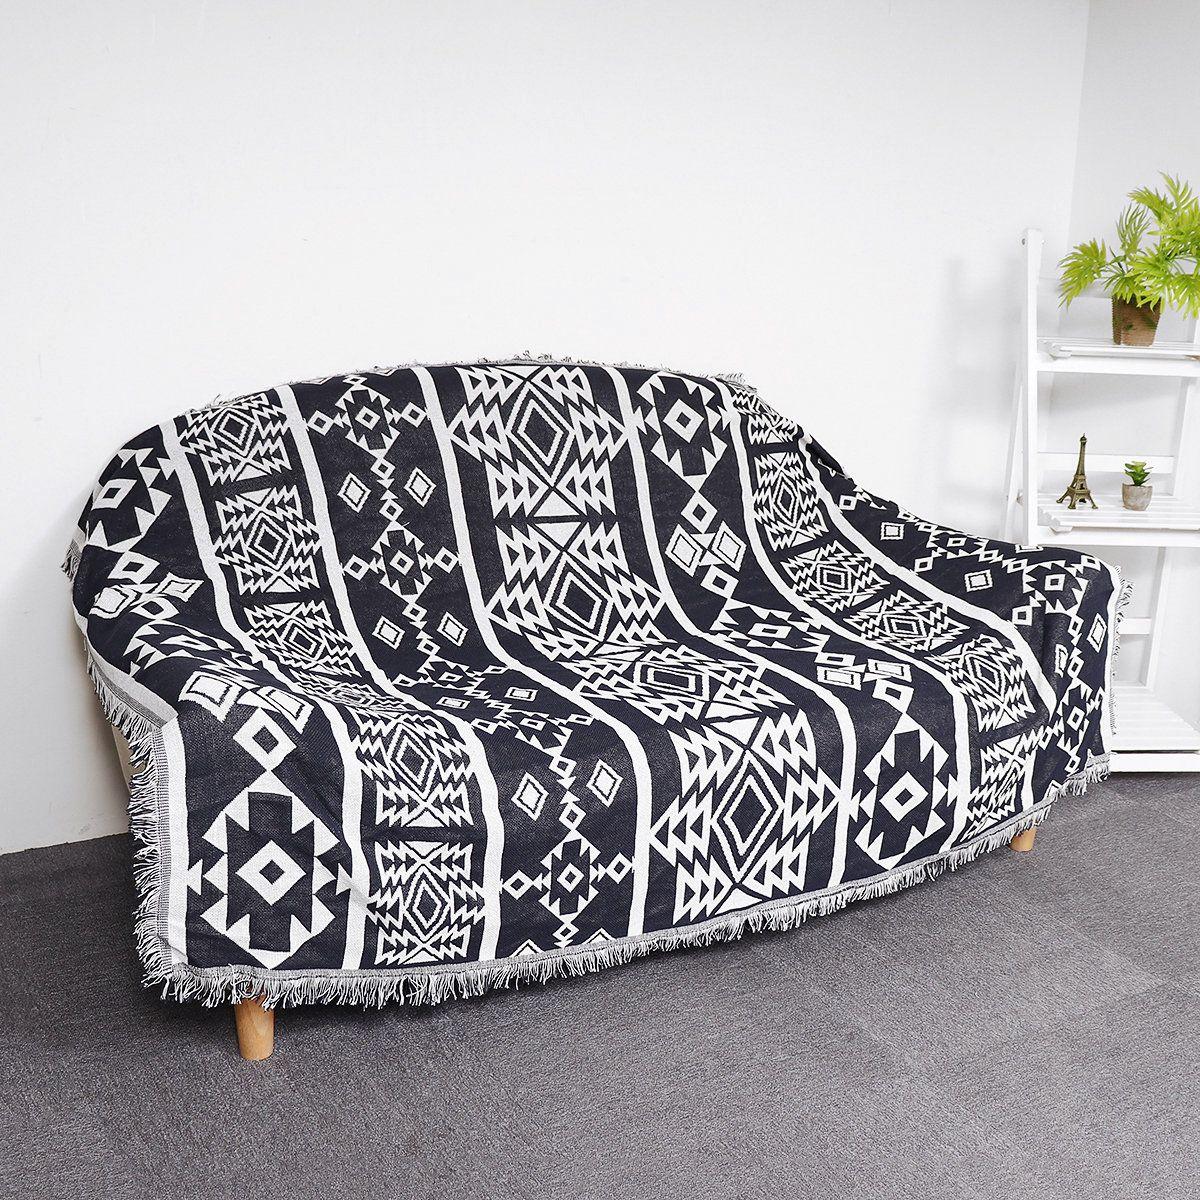 Sofa Throw Rug Couch Lounge Chair